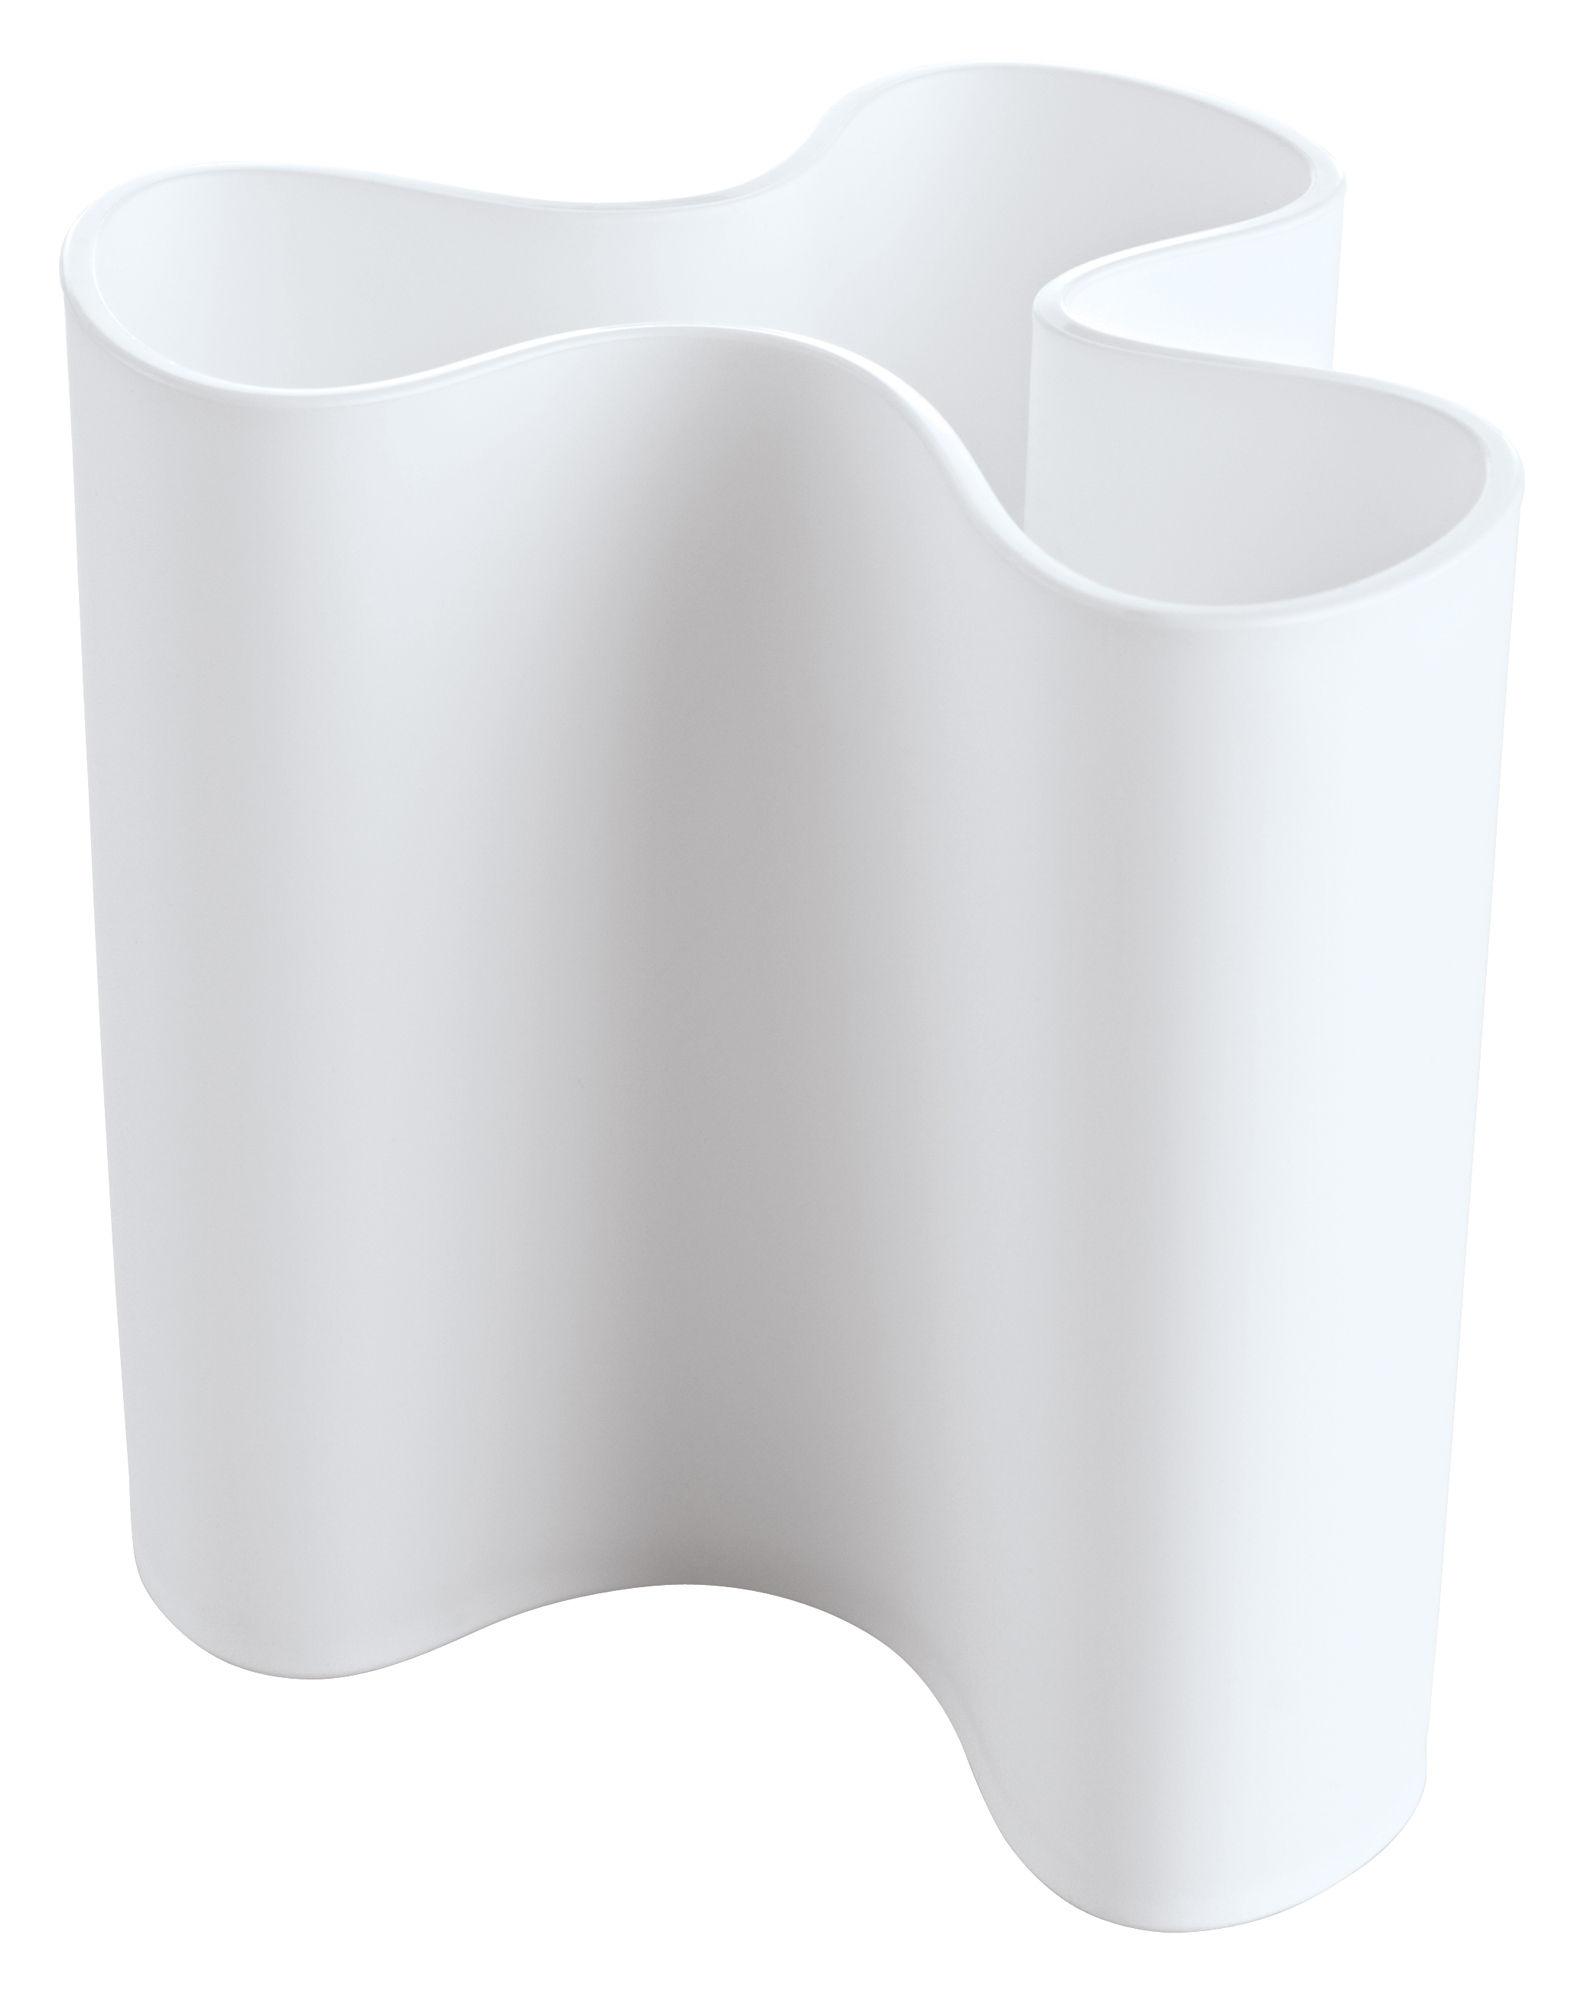 Decoration - Vases - Clara Vase by Koziol - White - Plastic material